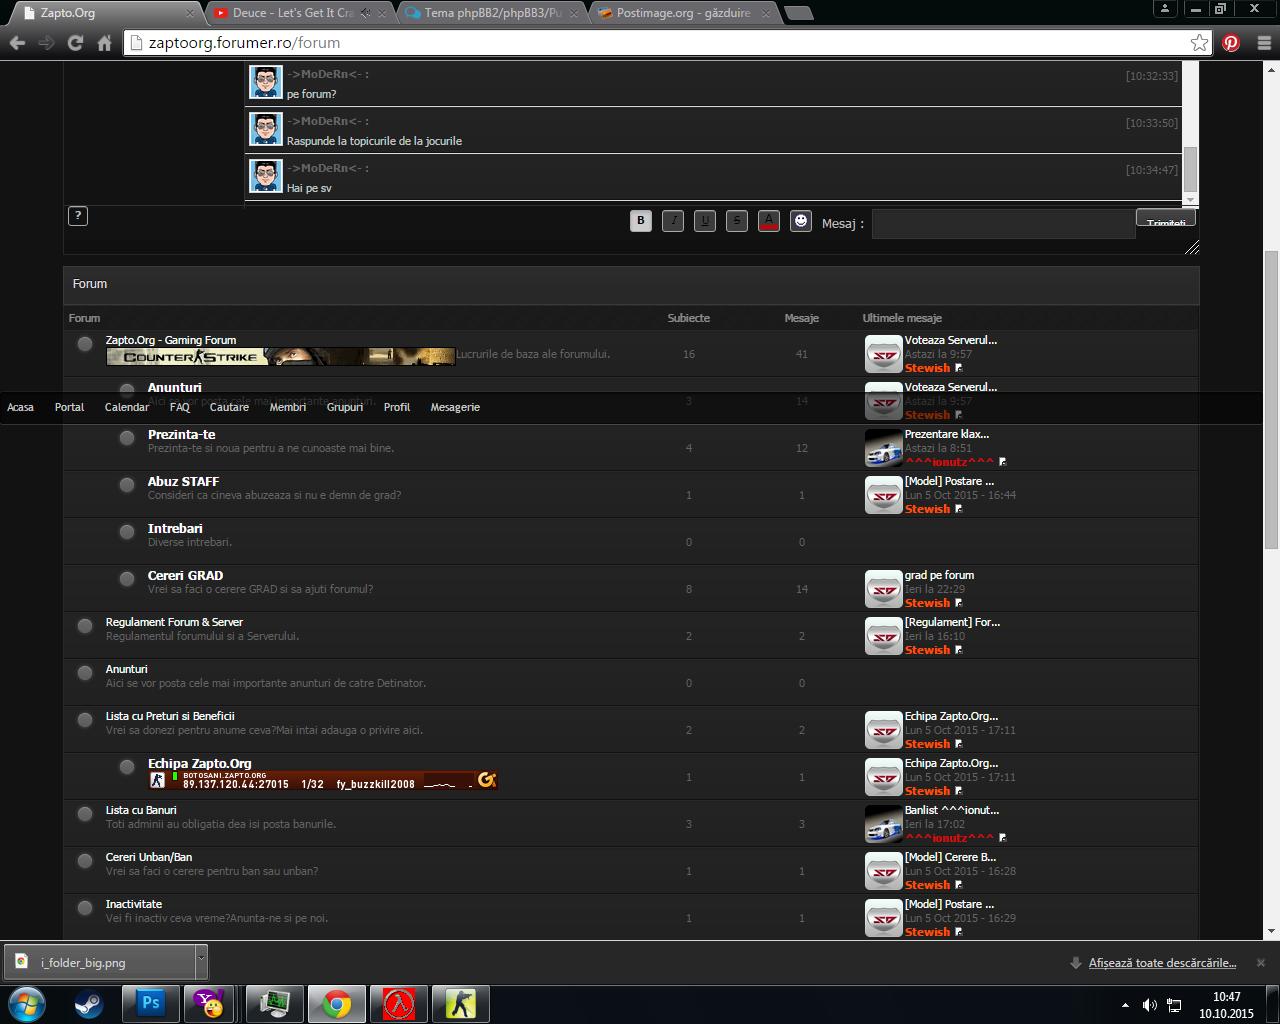 Tema phpBB2/phpBB3/PunBB/Invision Screenshot_52